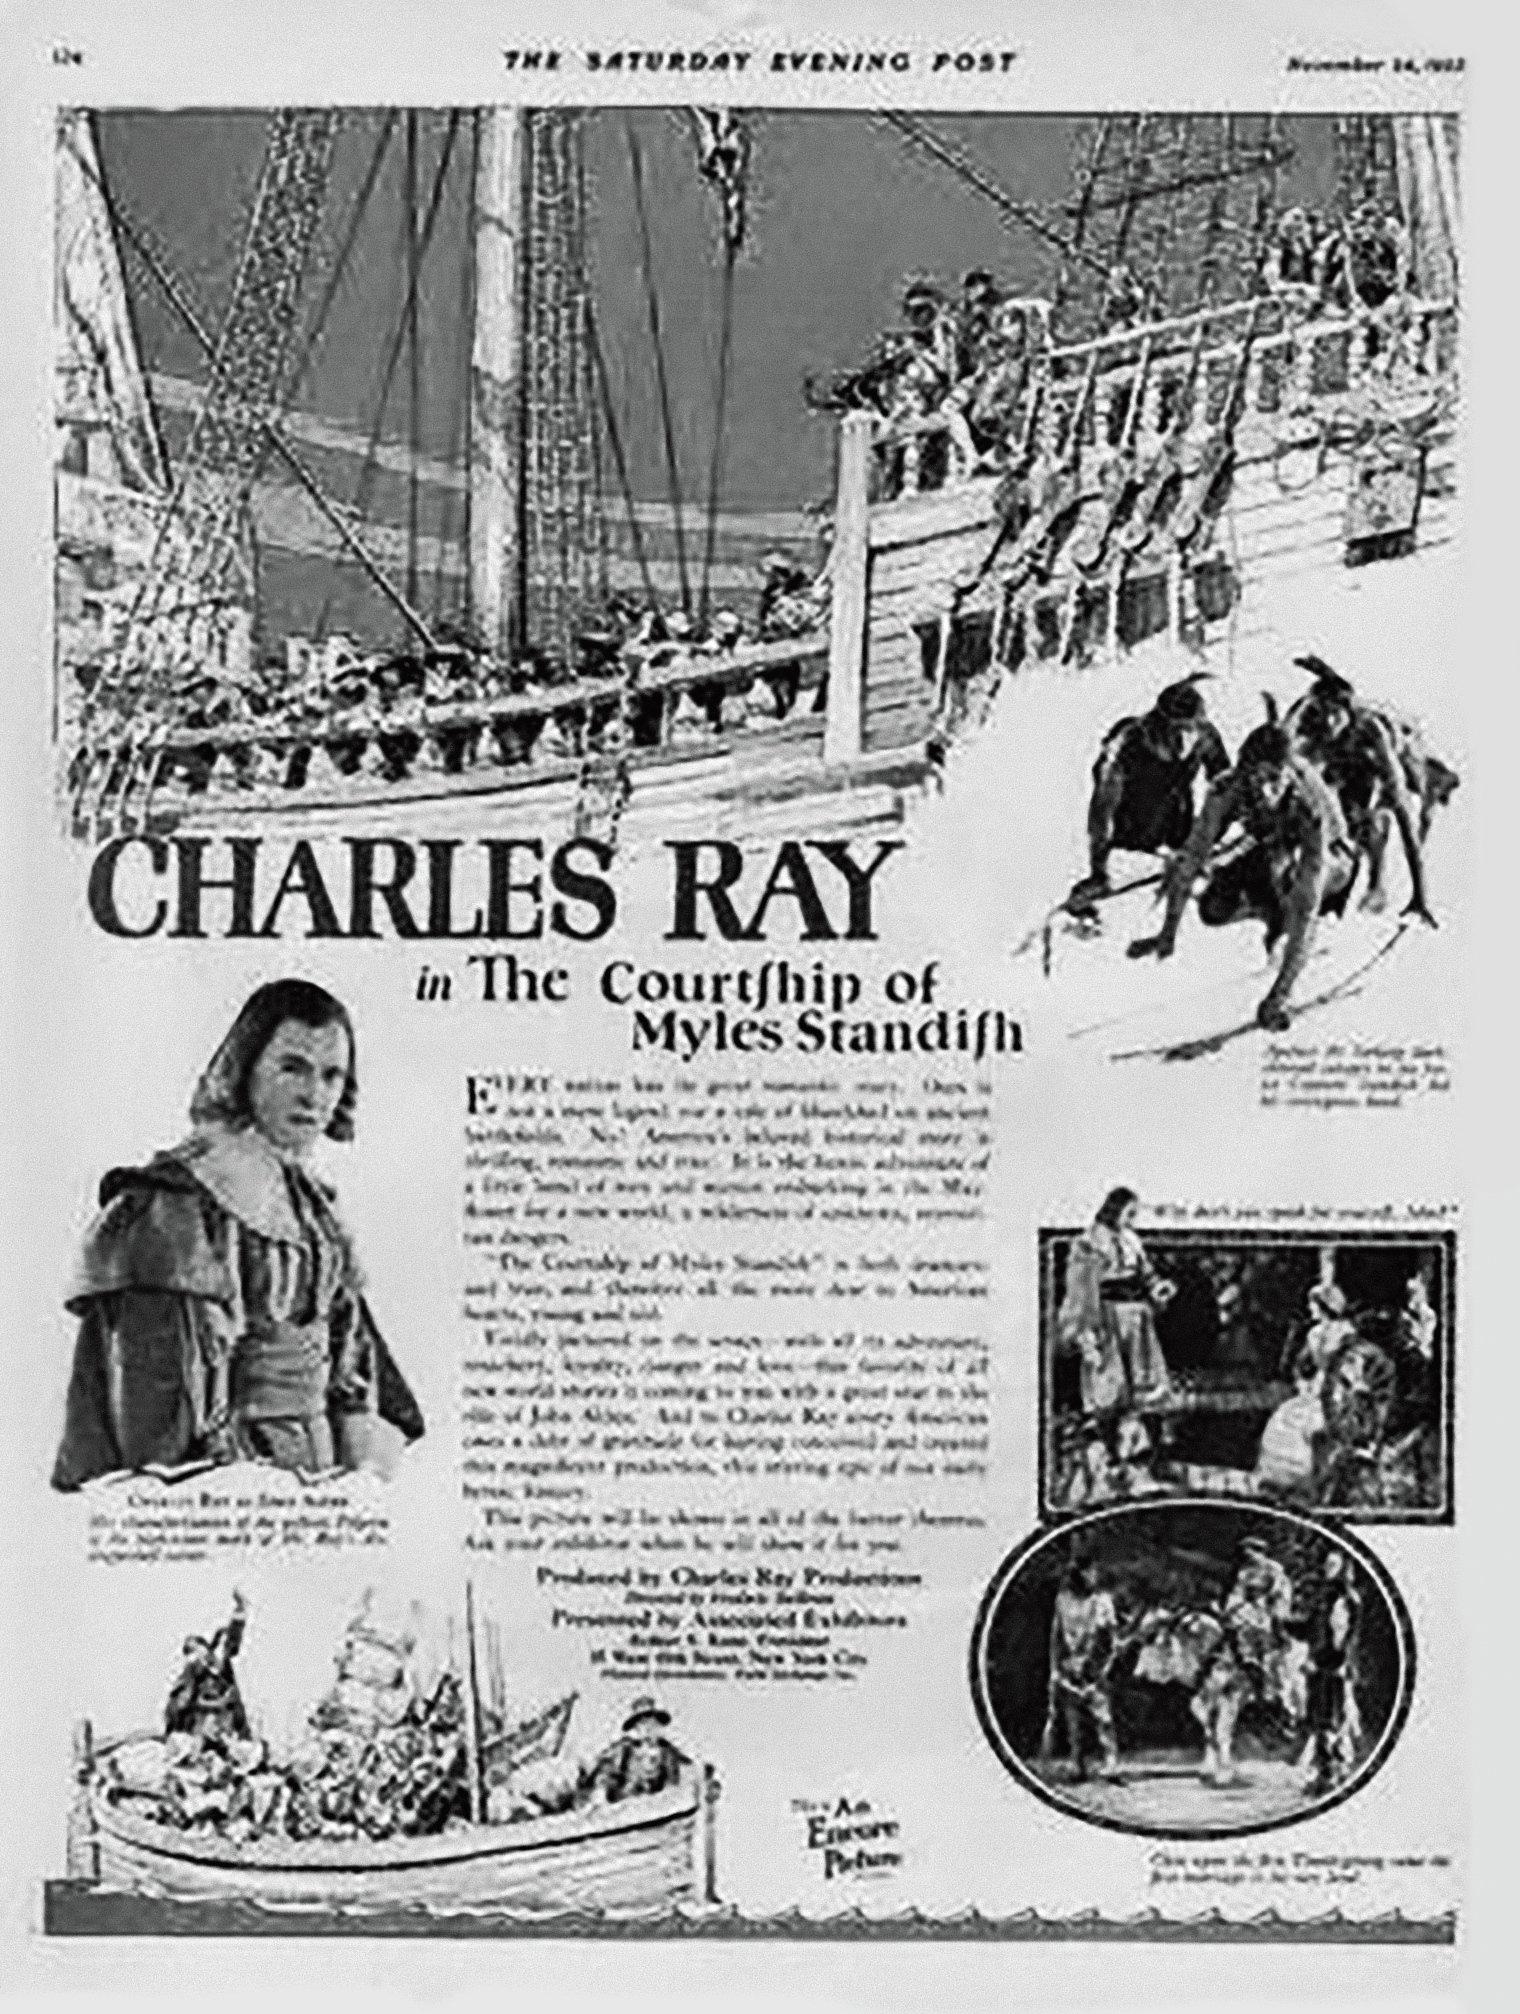 Charles Ray film